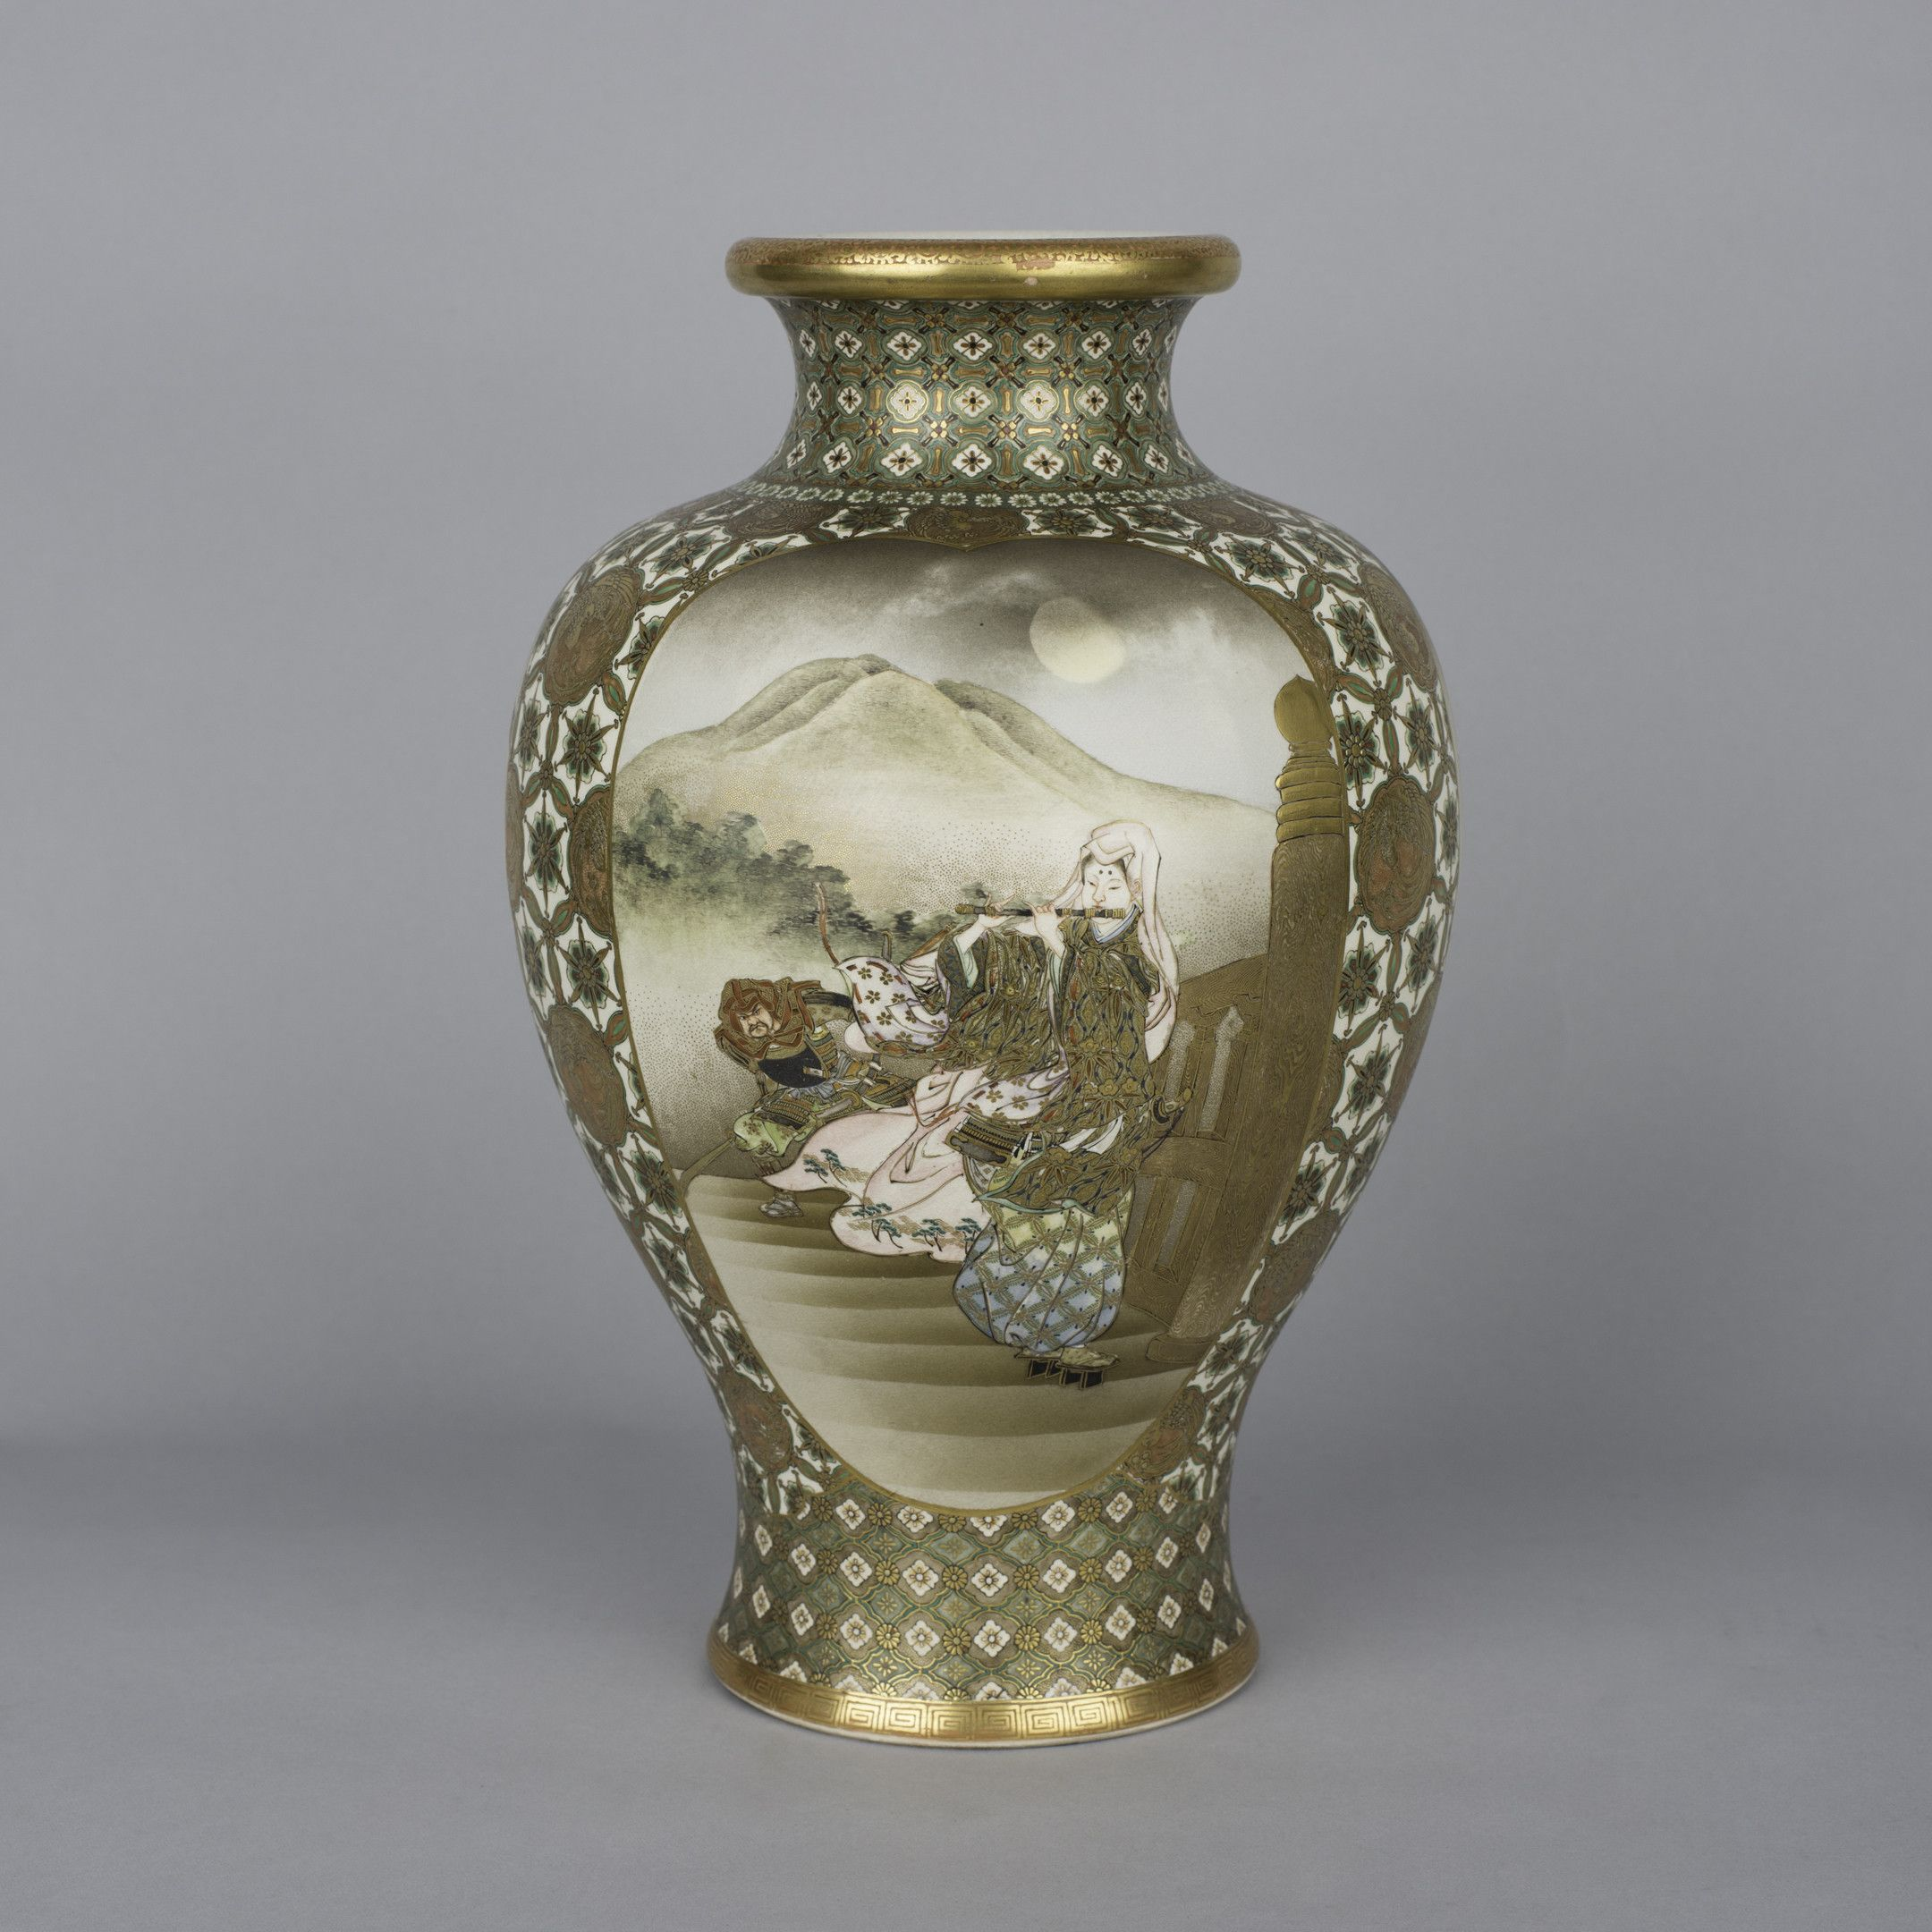 Satsuma vase meiji period 1868 1912 signed kinkozan meiji explore satsuma vase japanese culture and more reviewsmspy